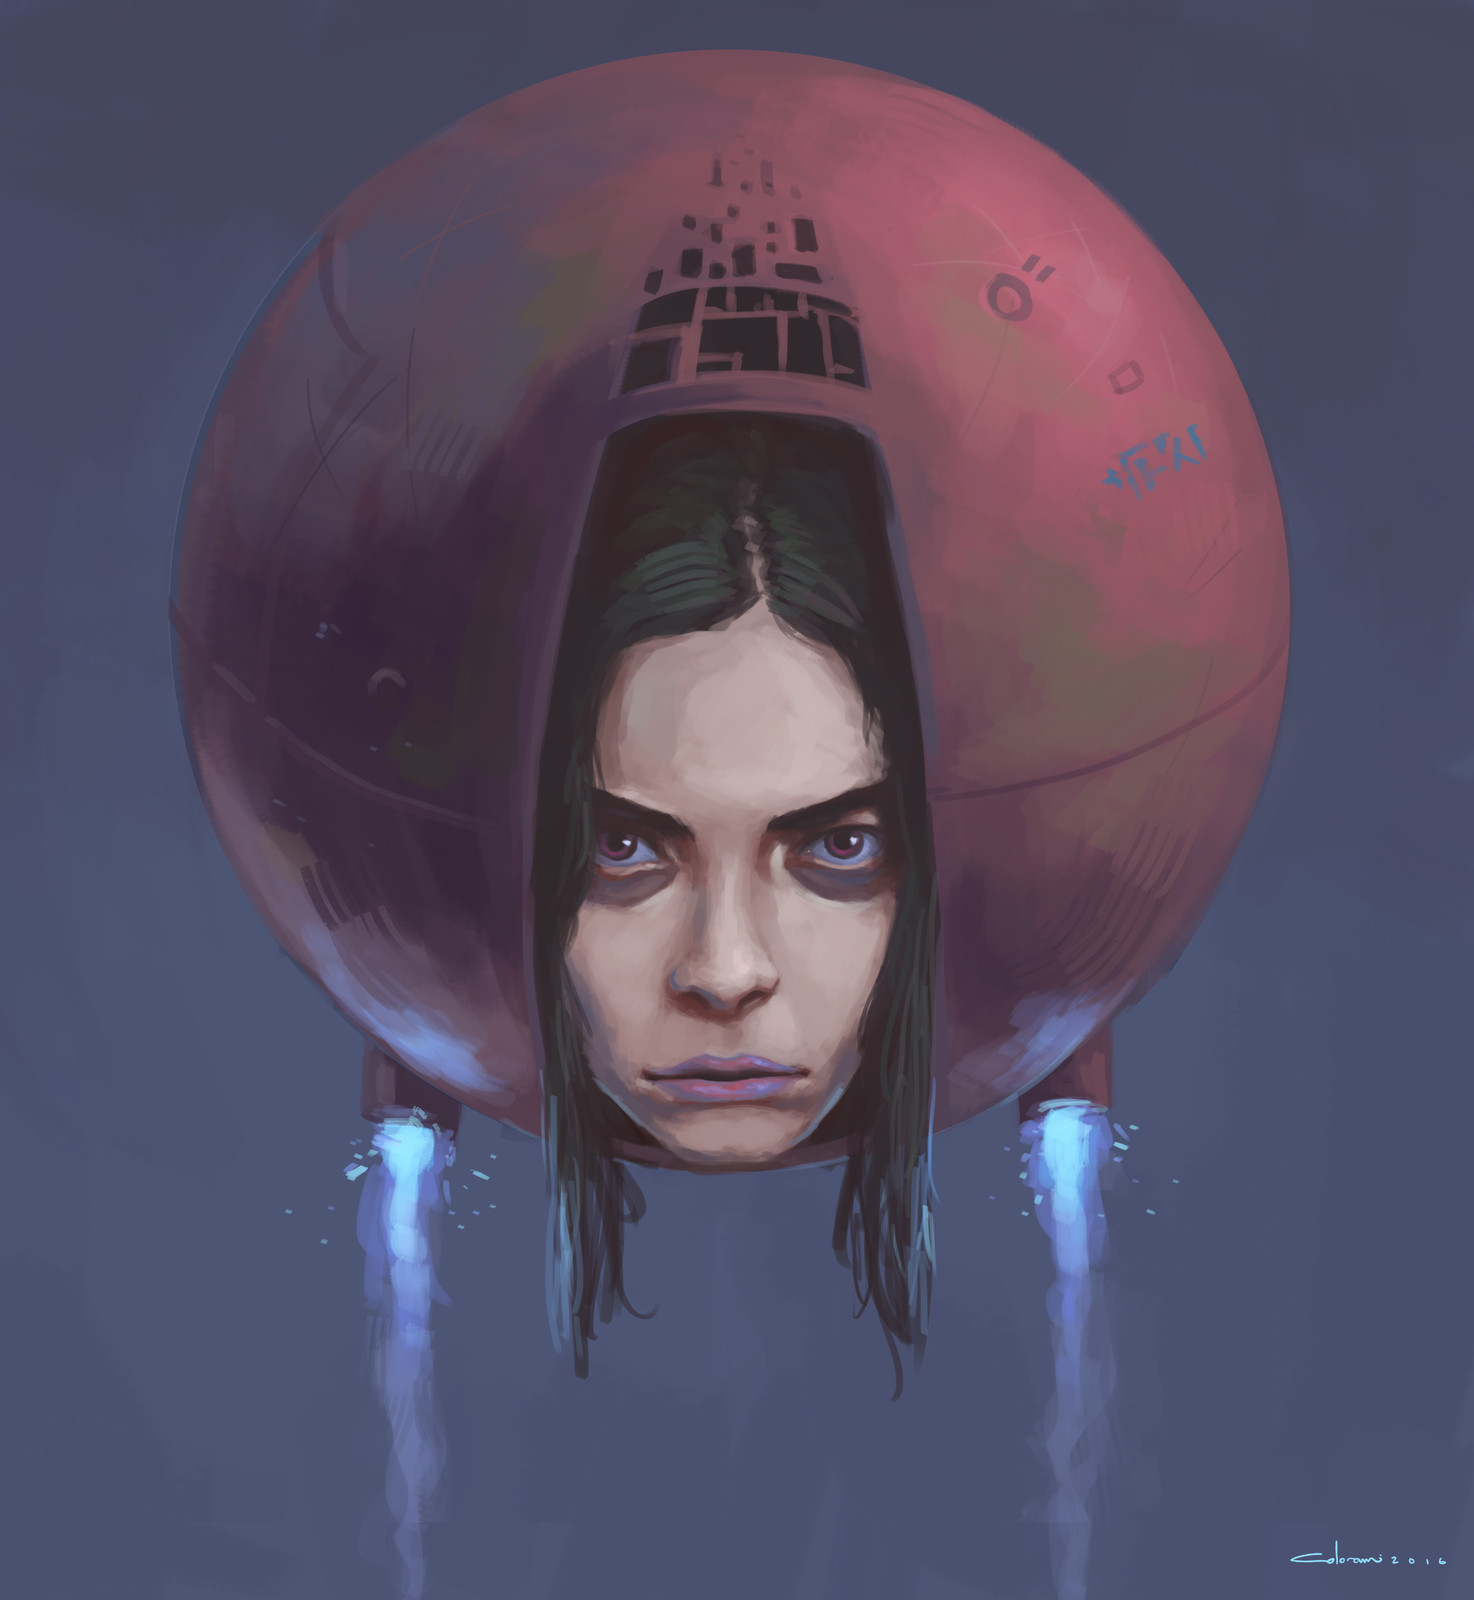 Floating head